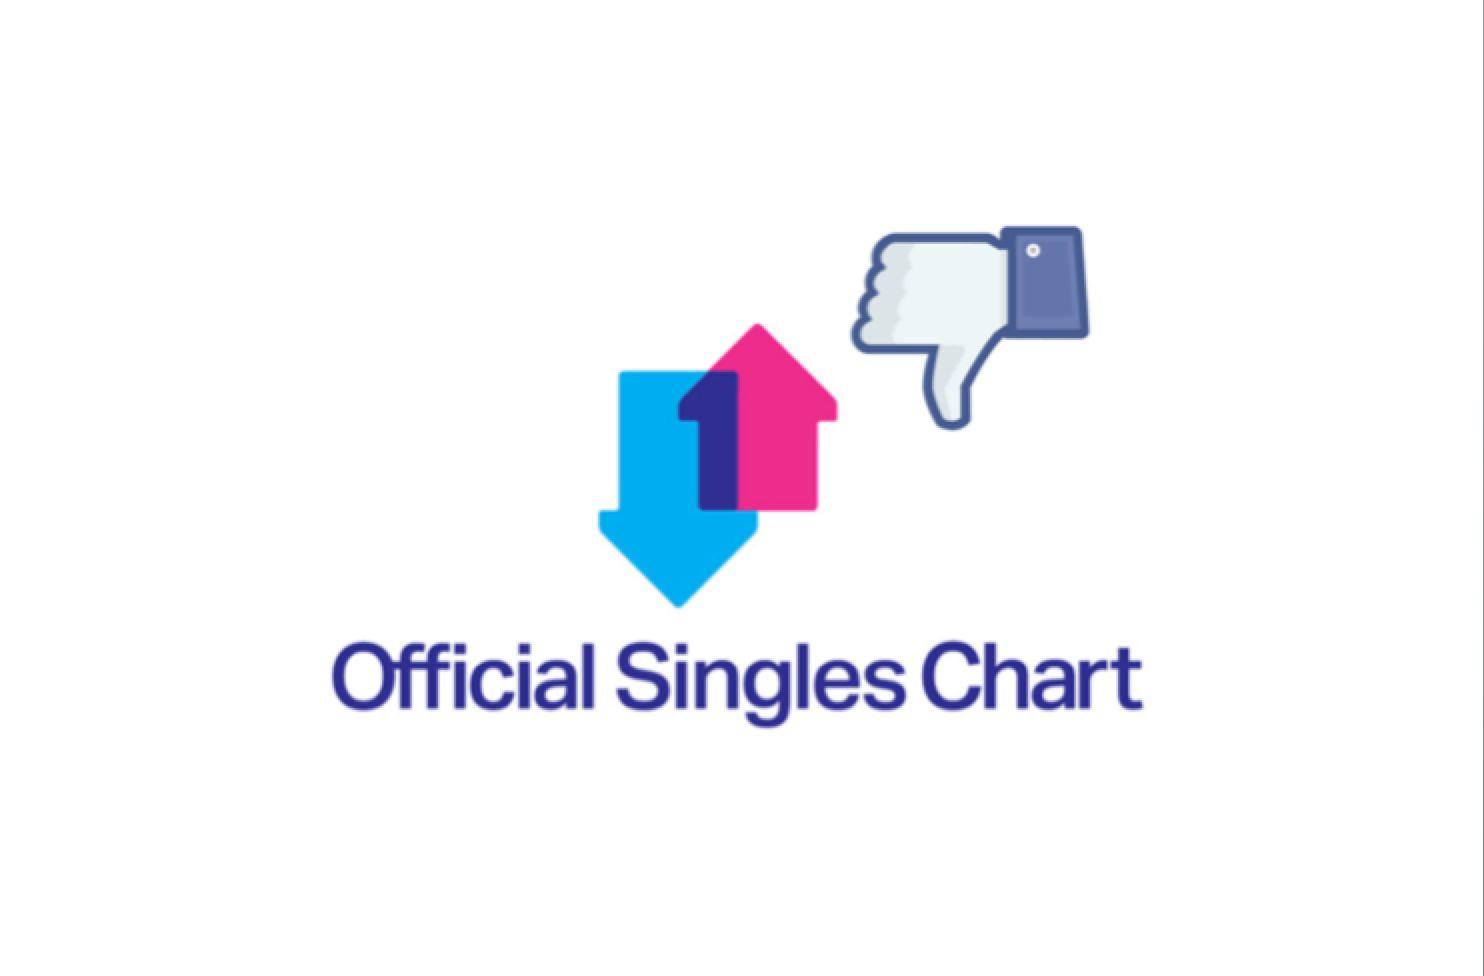 Has Streaming Made the UK Singles Chart Boring?